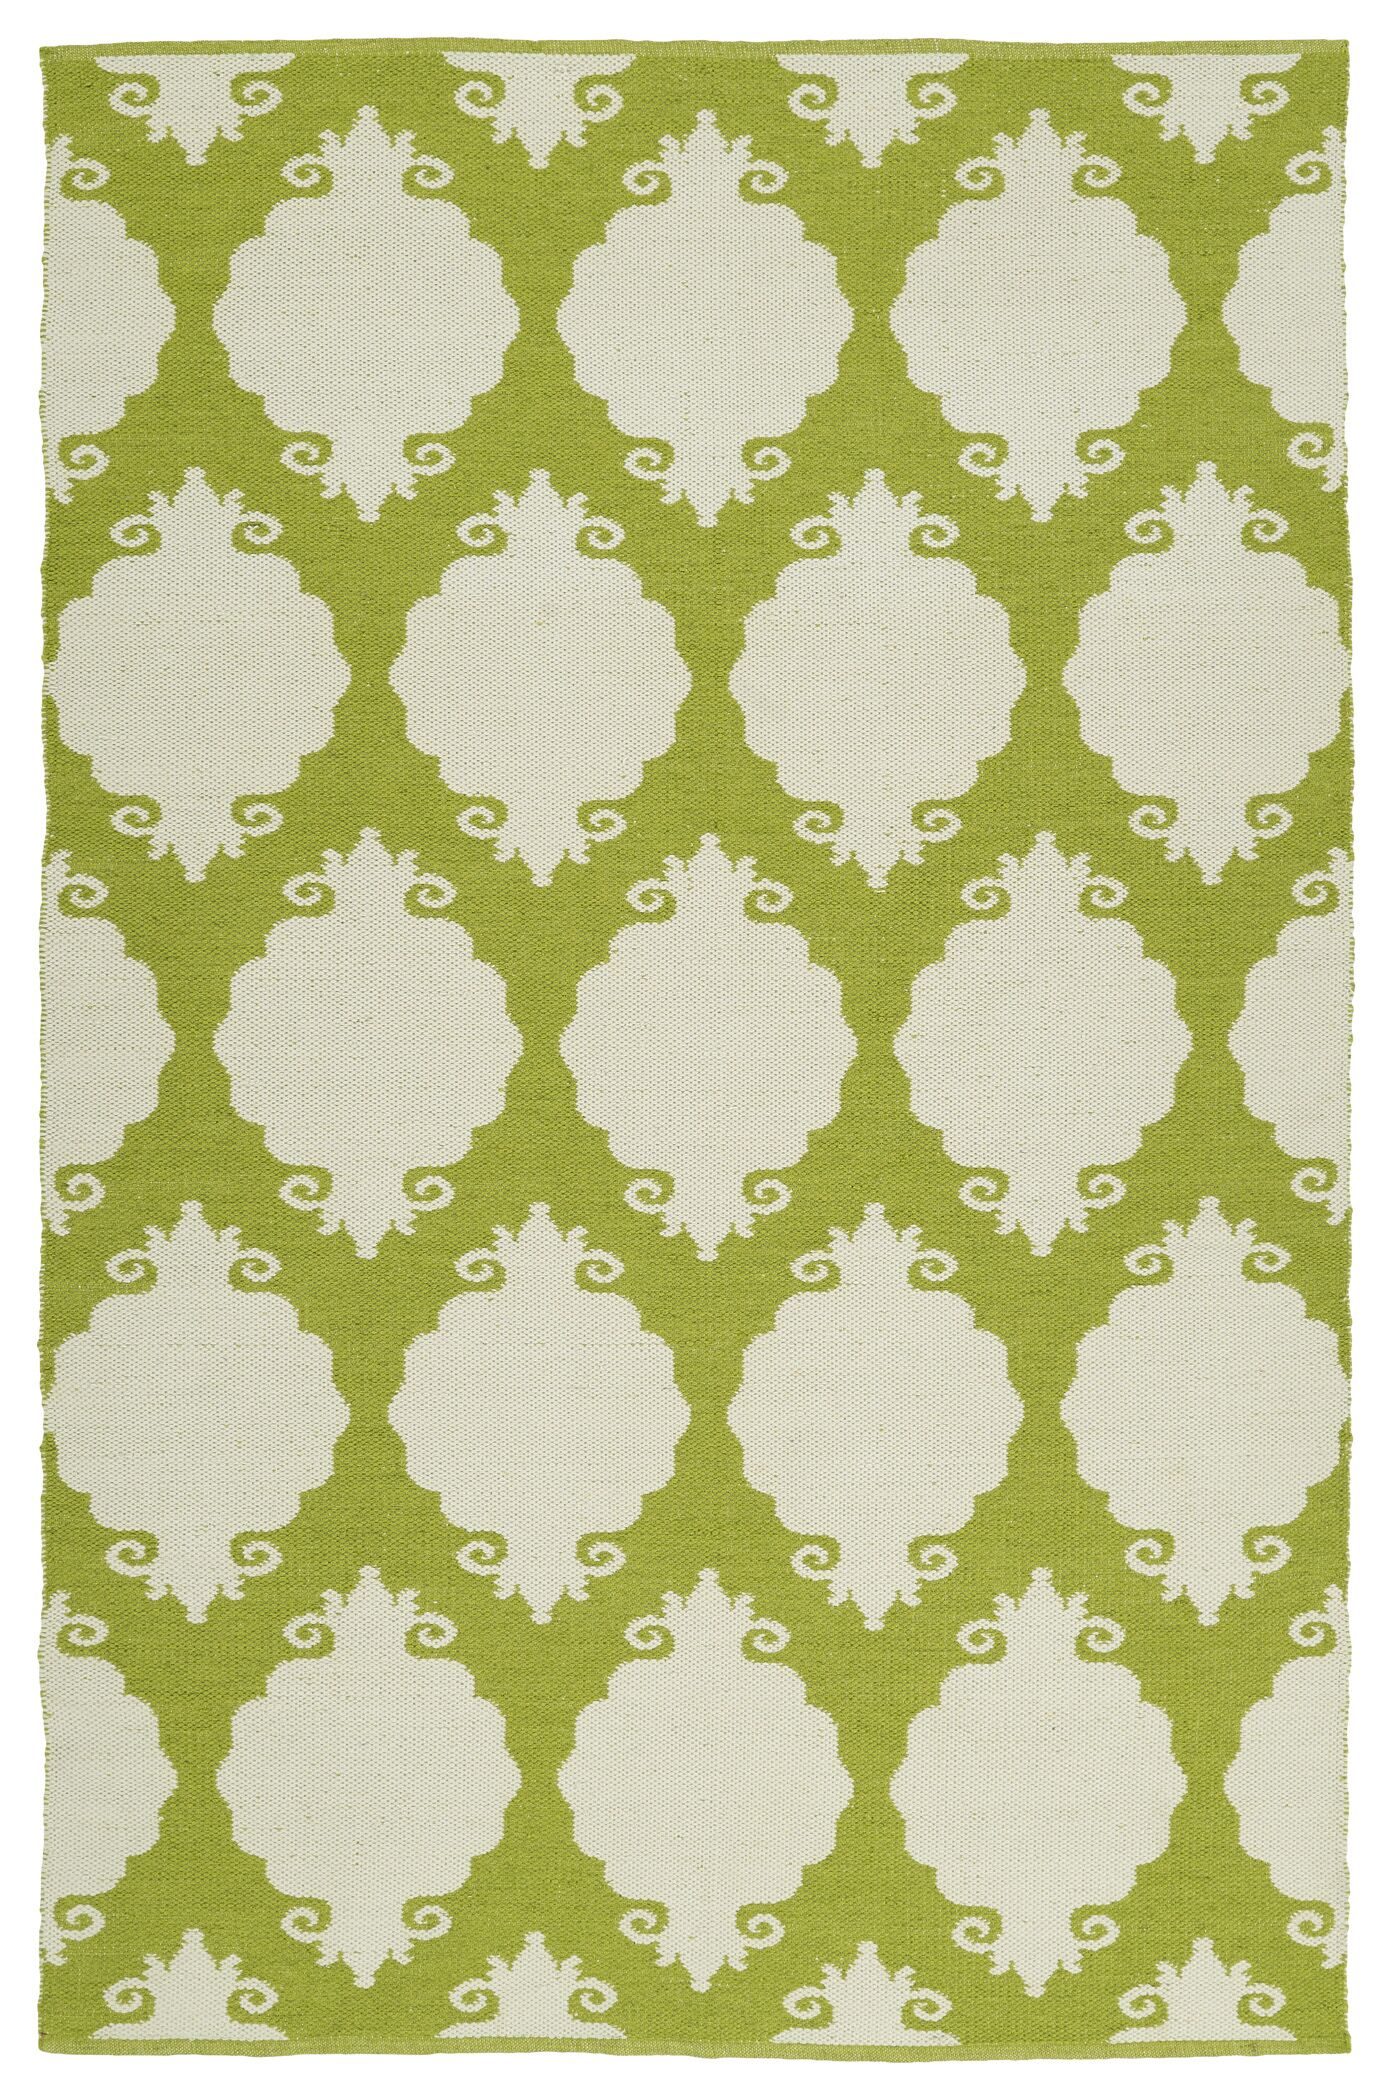 Dominic Wasabi/Cream Indoor/Outdoor Area Rug Rug Size: Rectangle 5' x 7'6